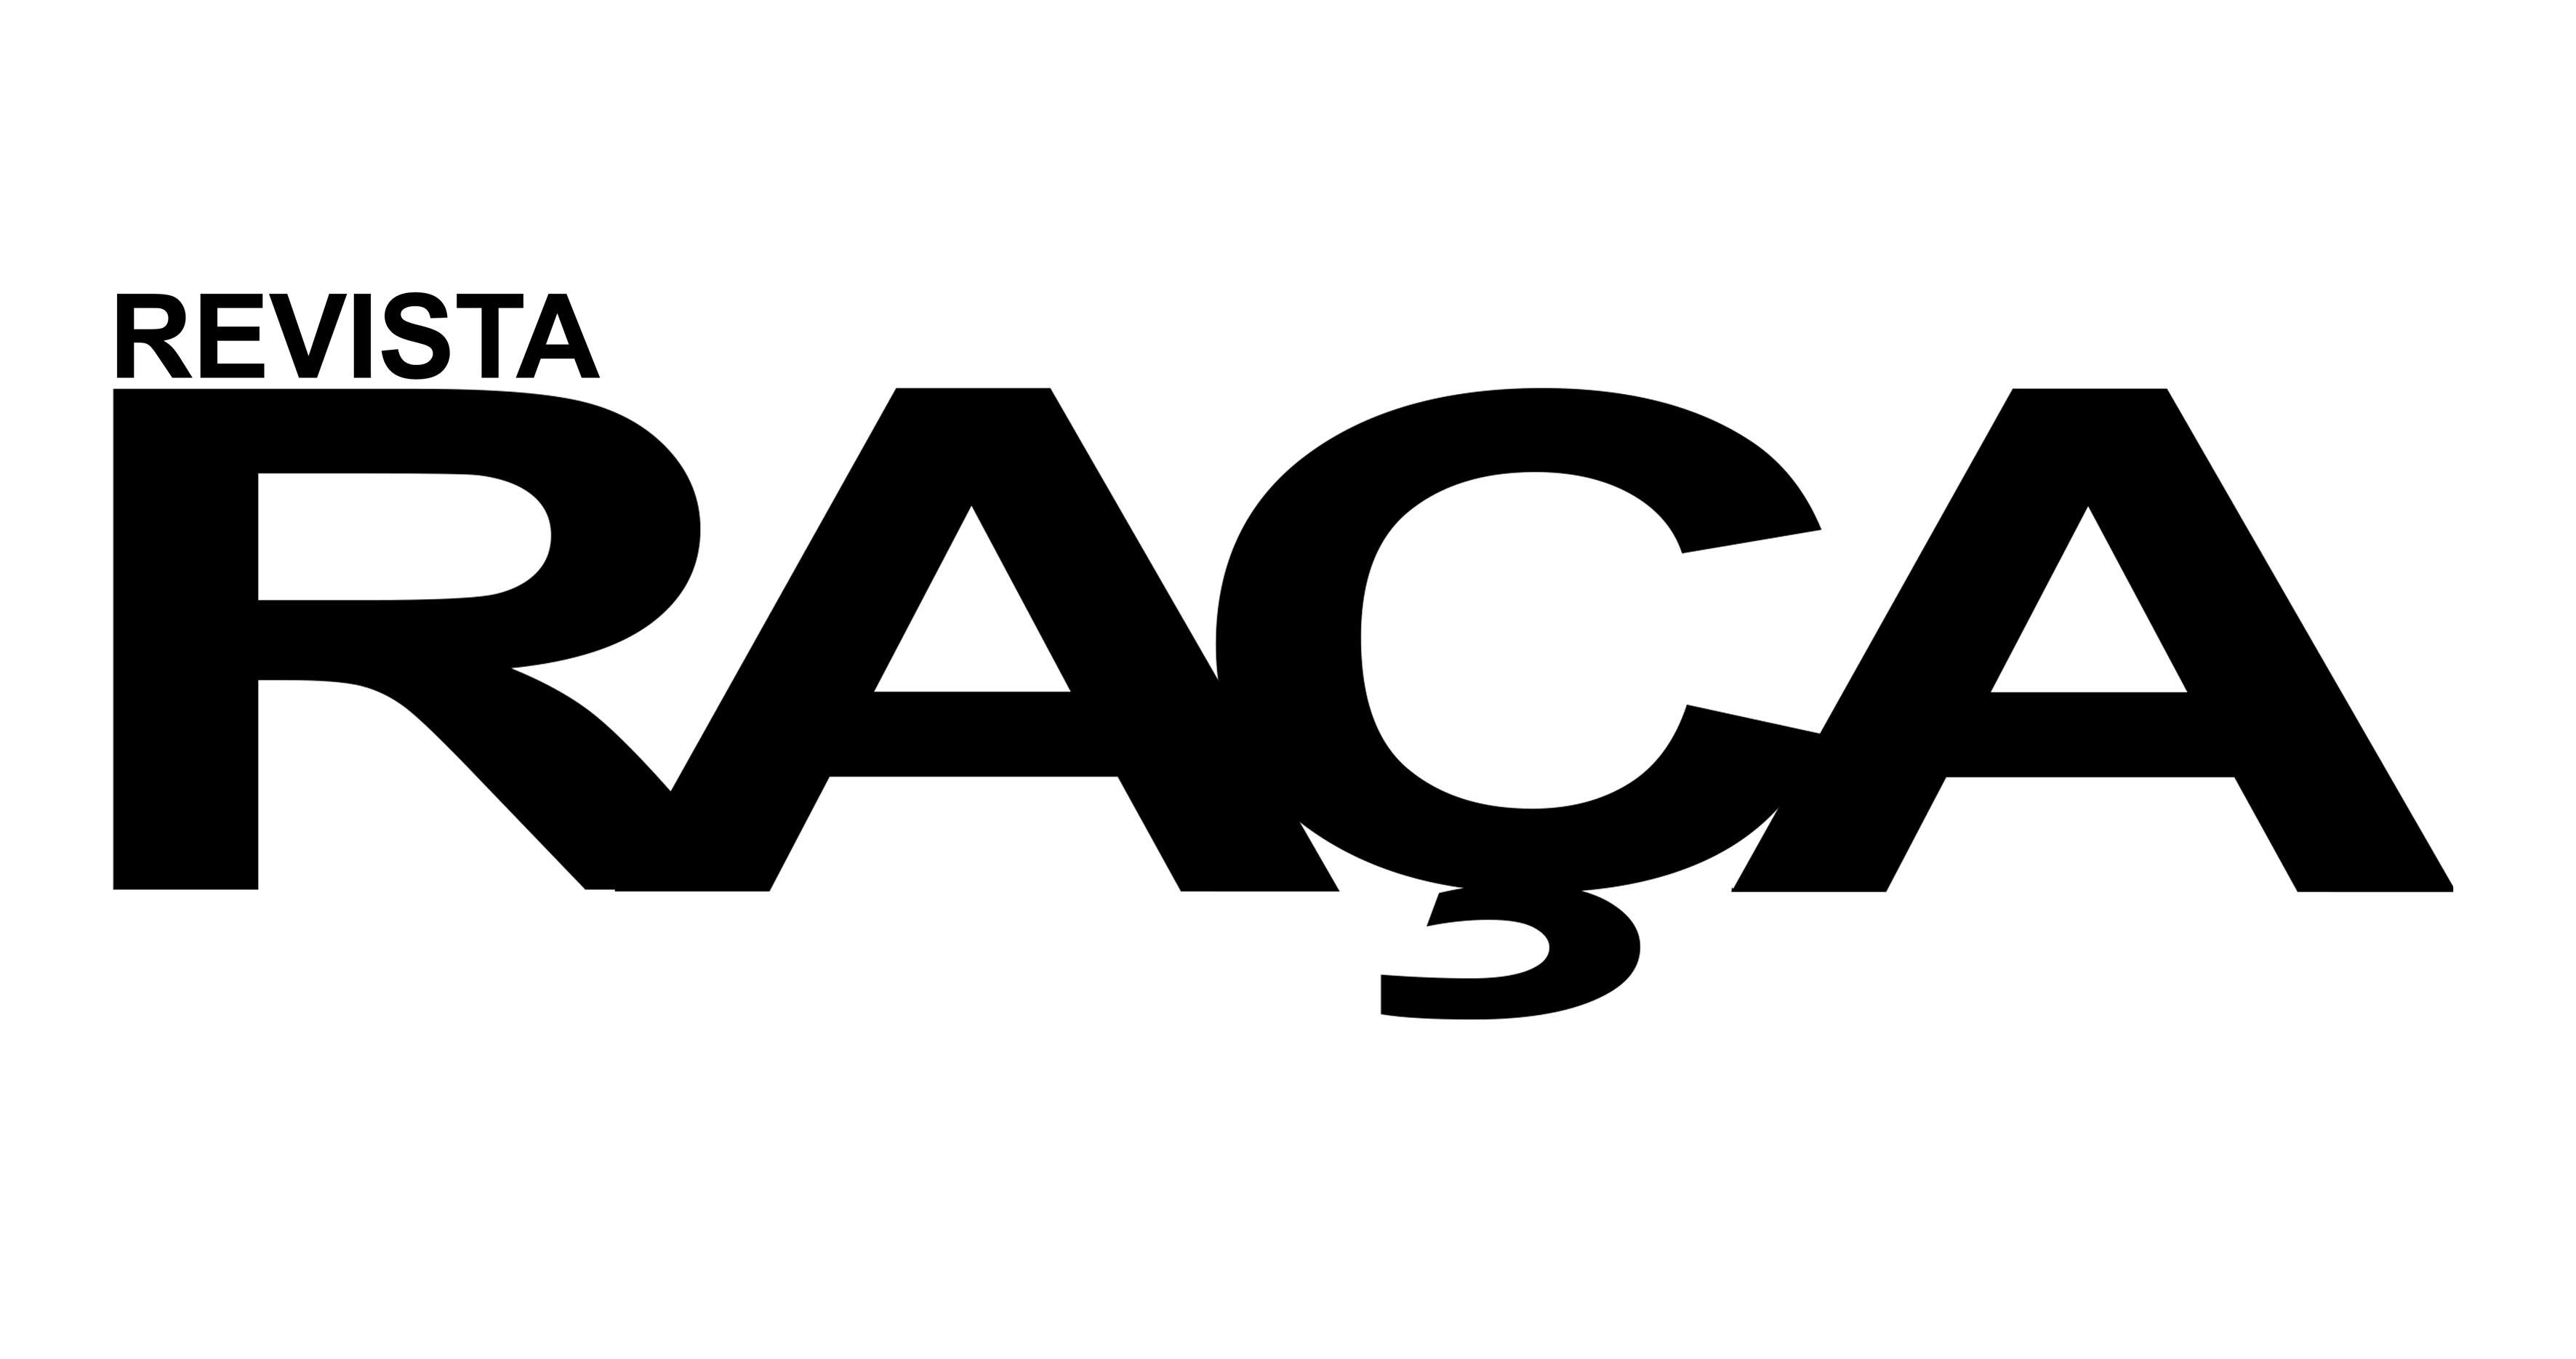 https://revistaraca.com.br/wp-content/uploads/2017/07/raca-1.jpg